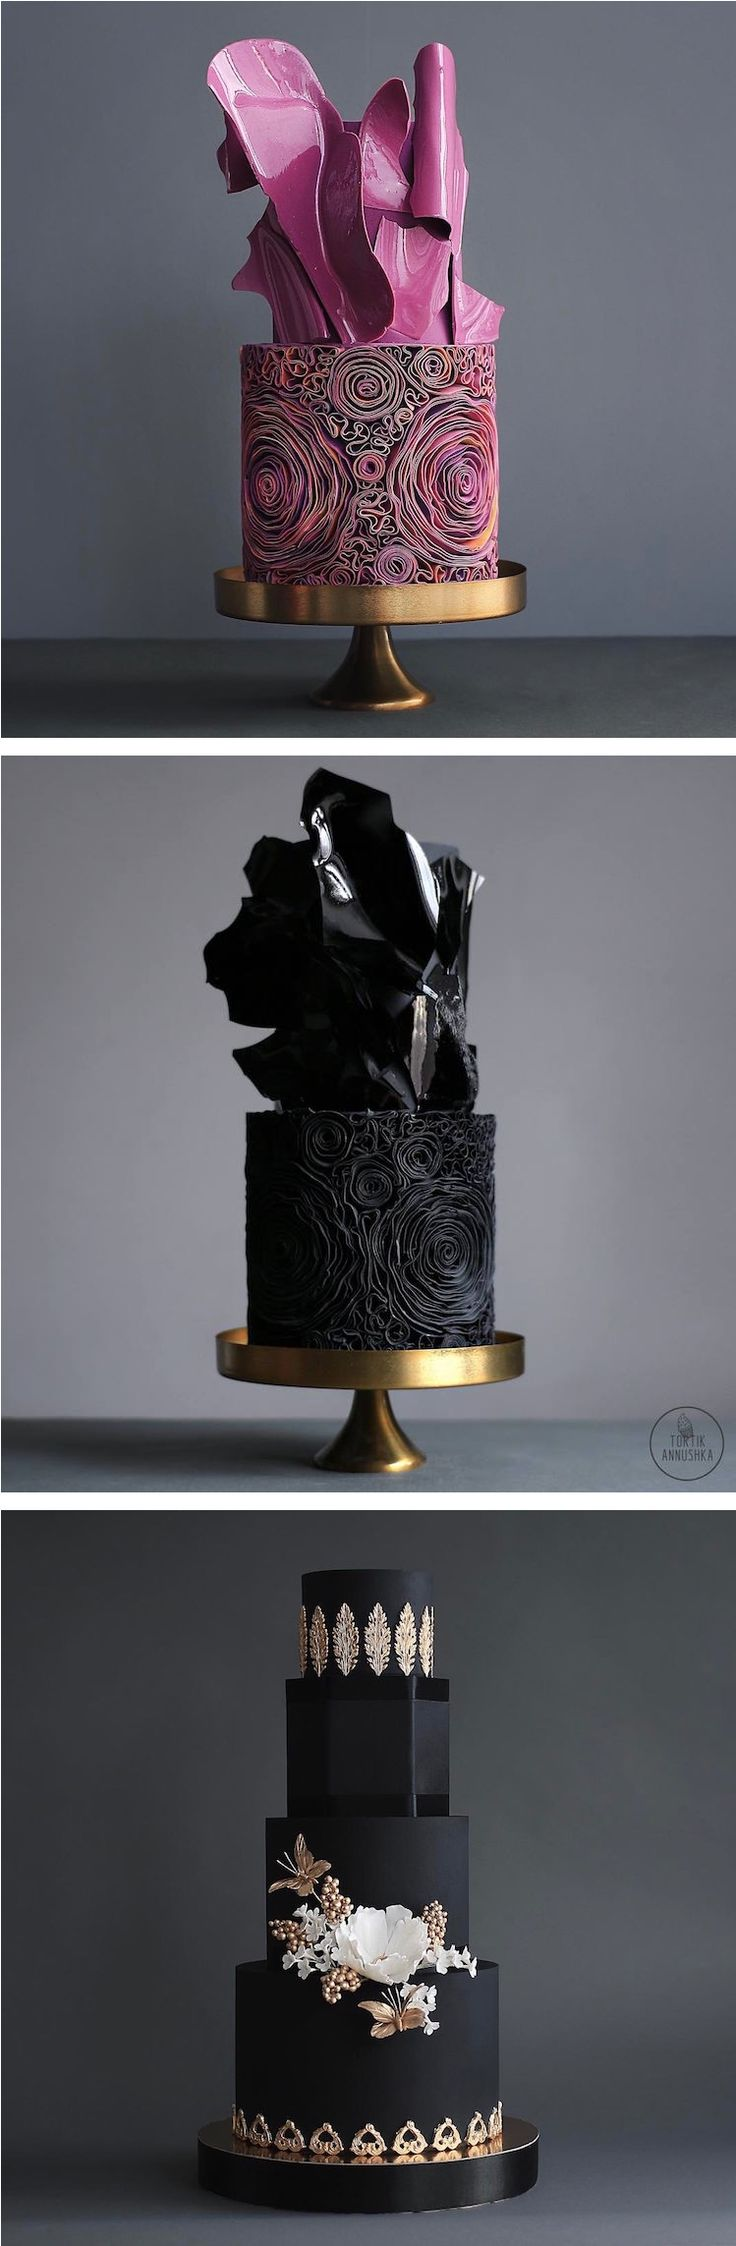 best cake inspiration images on pinterest